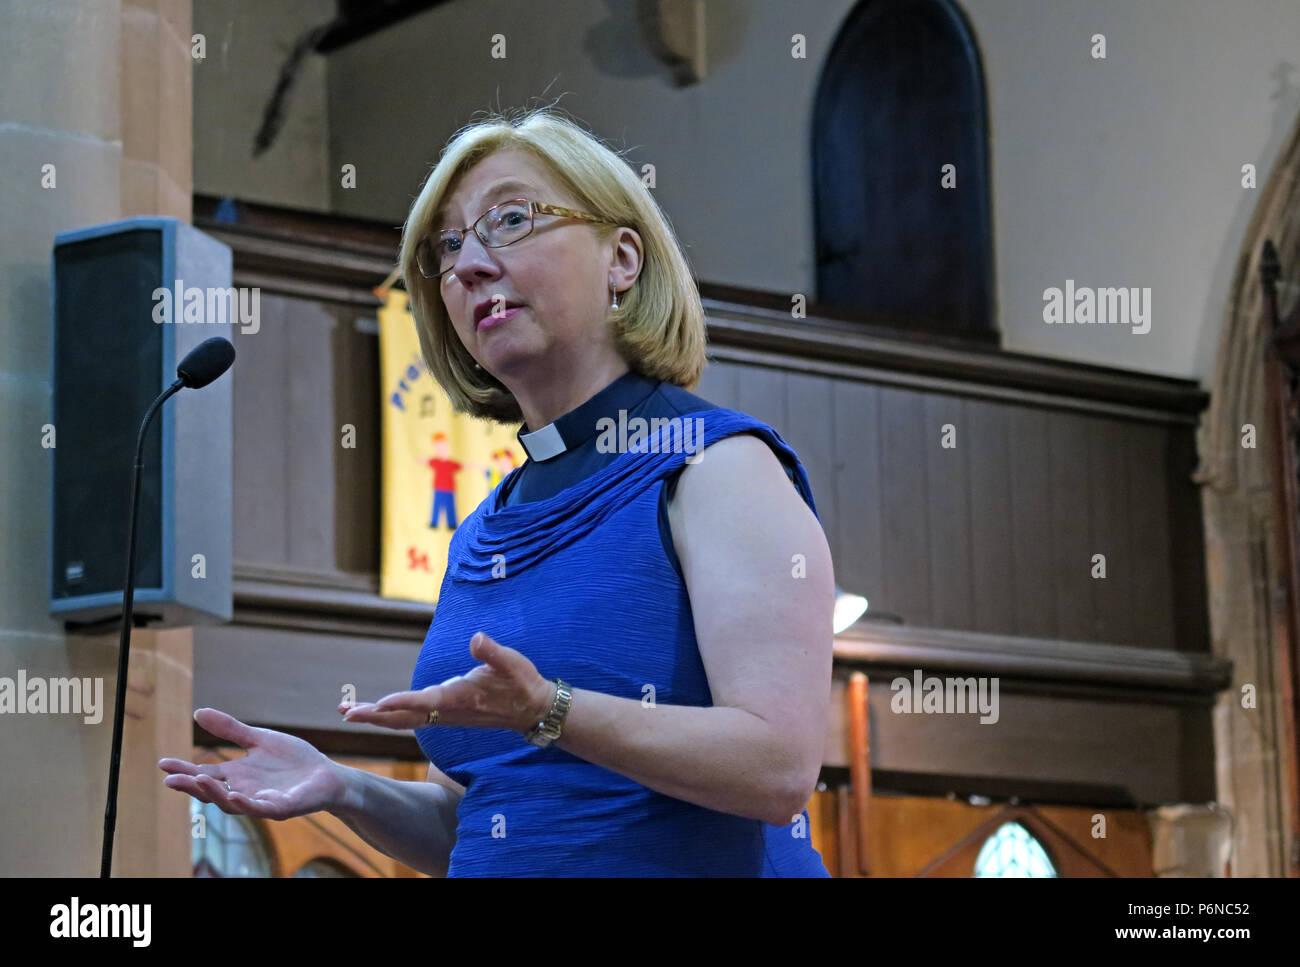 @Hotpixuk,GoTonySmith,female,woman,vicar,Rev,Bev,Beverley,Jameson,village,Warrington,Cheshire,WA13,Church Road,WA13 0QS,Christian,Church Of England,speaking,at a,microphone,in church,Vicar,Vicar of Dibley,St Marys,St Marys Church,speaks,clergy,equal opportunities